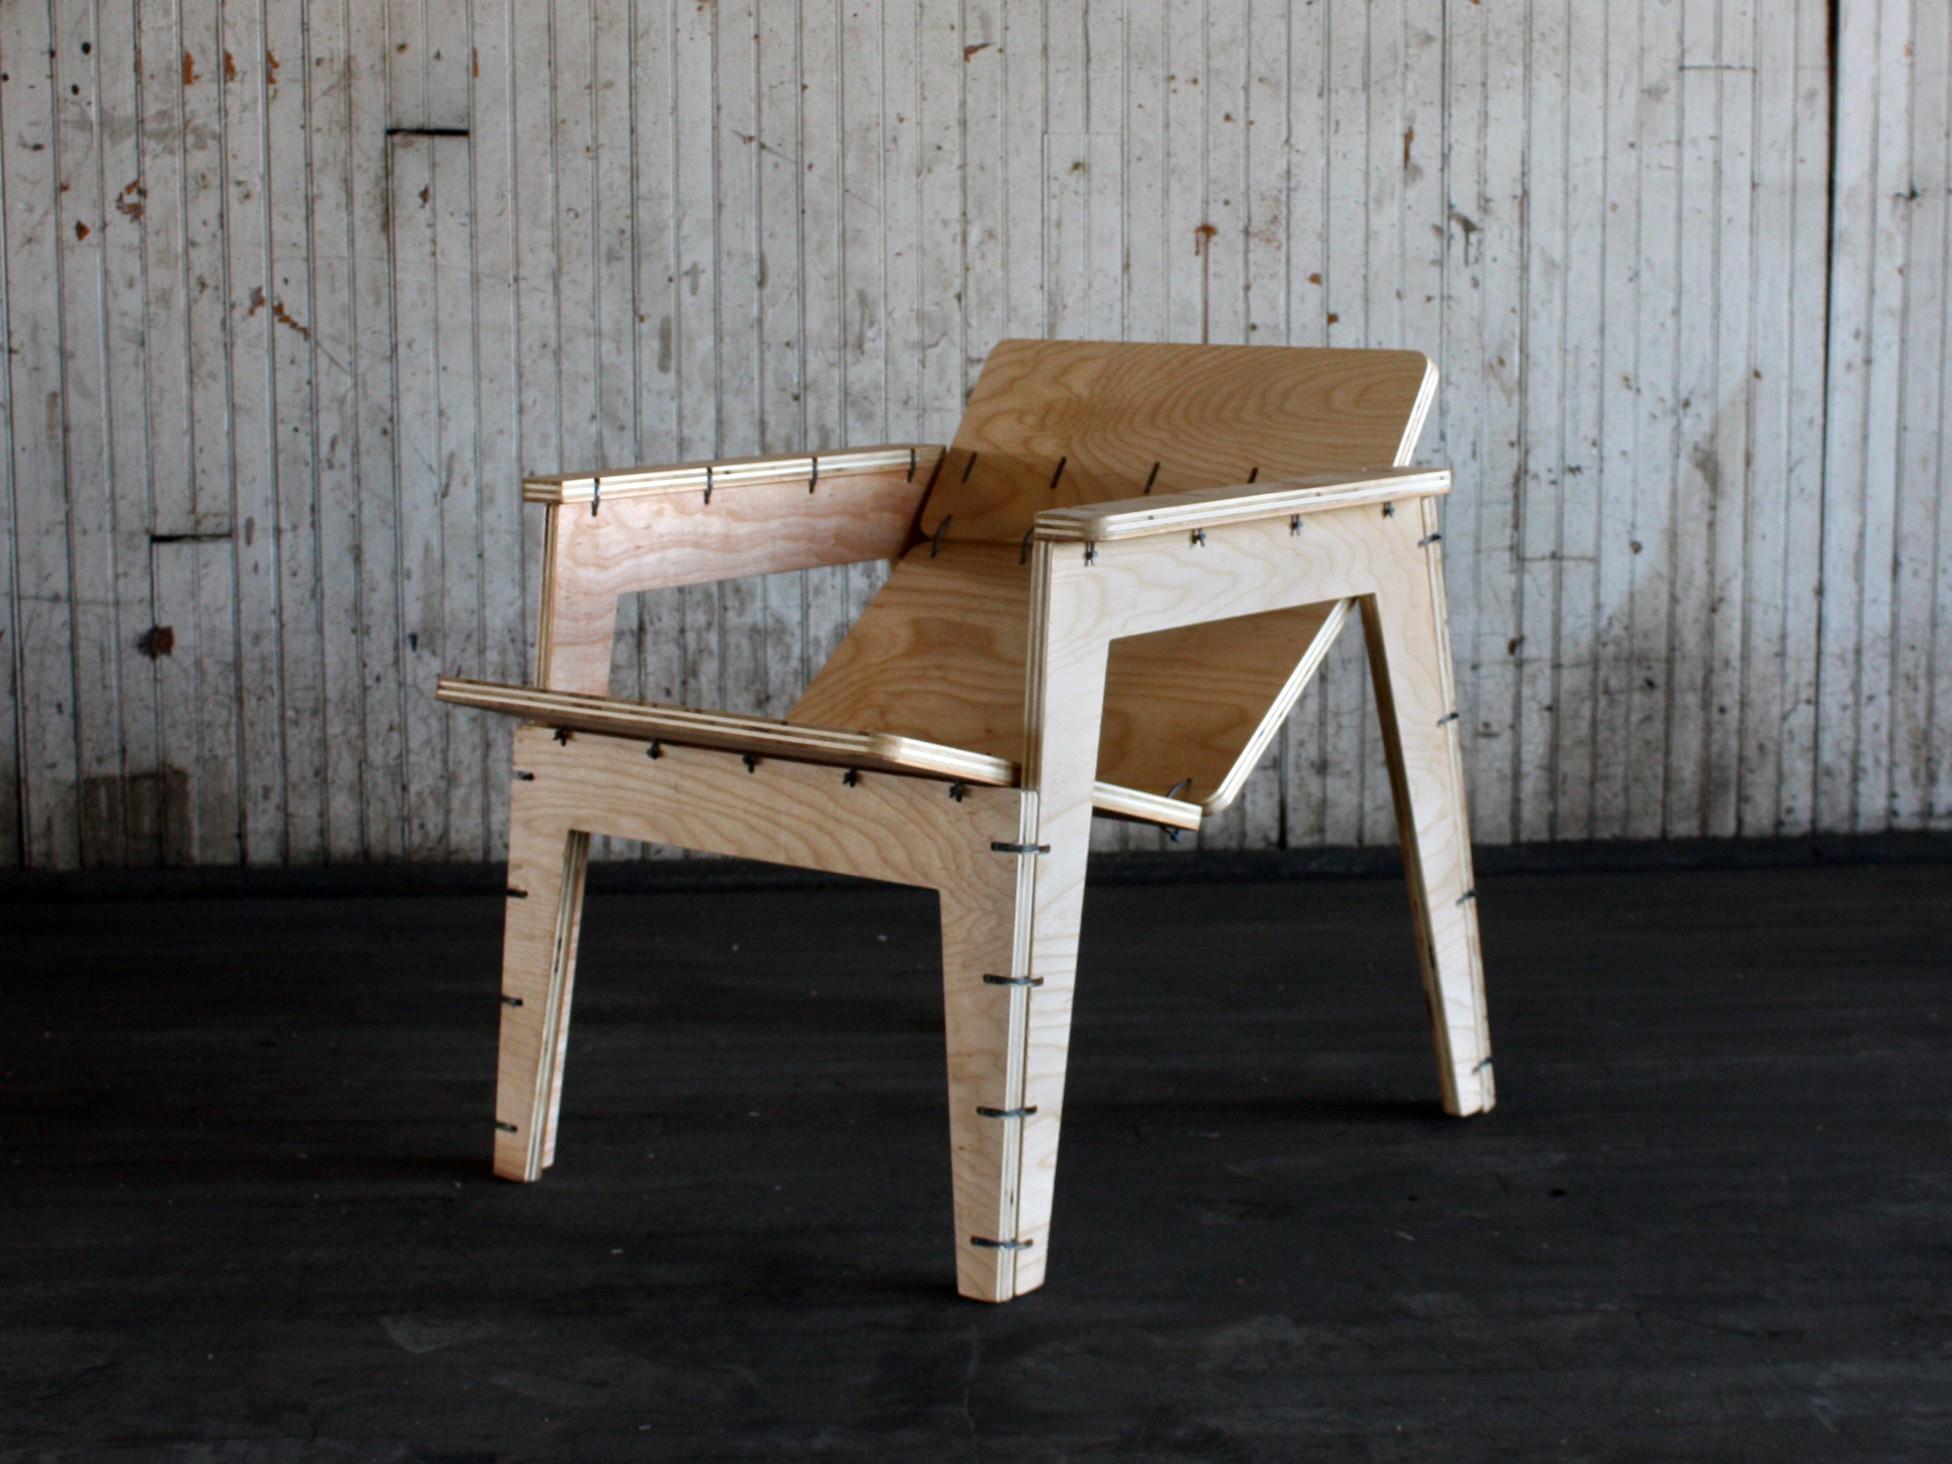 The Zip-tie Lounge Chair